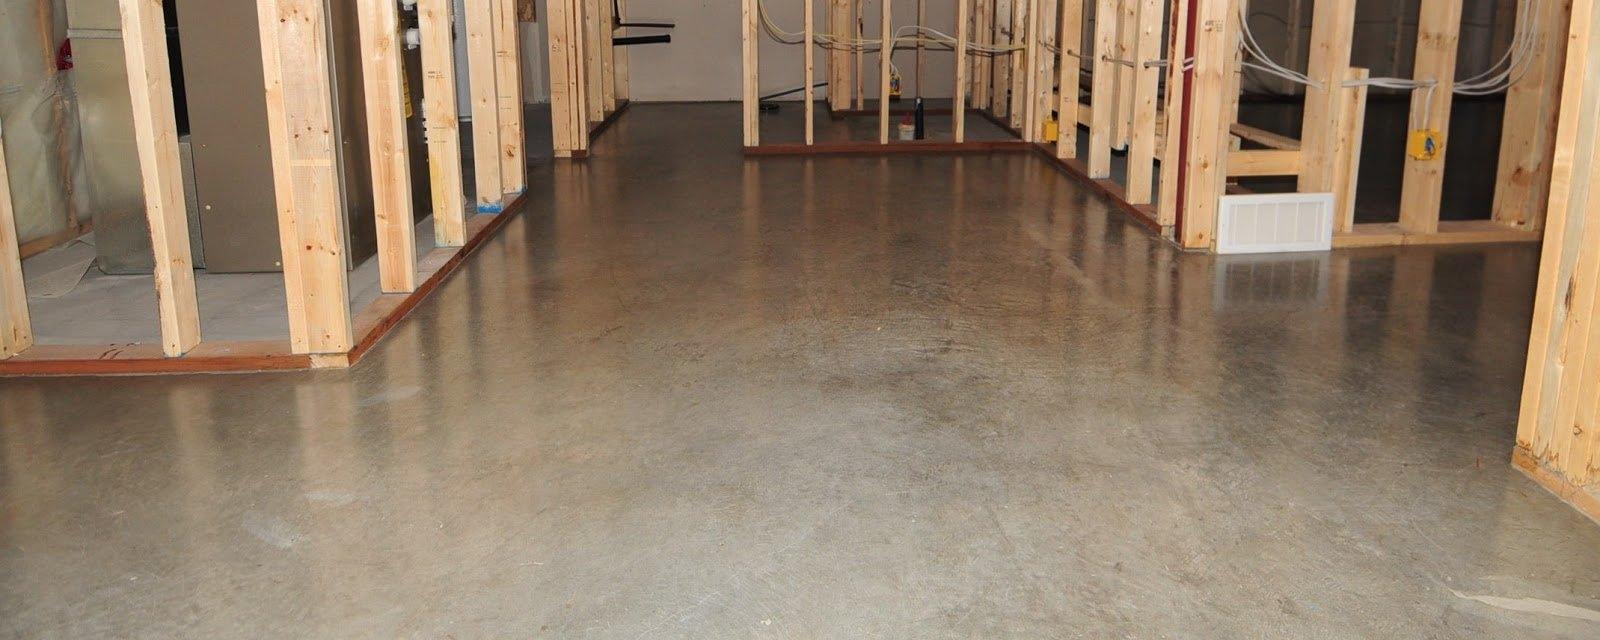 Cement Sealer For Basement Floor